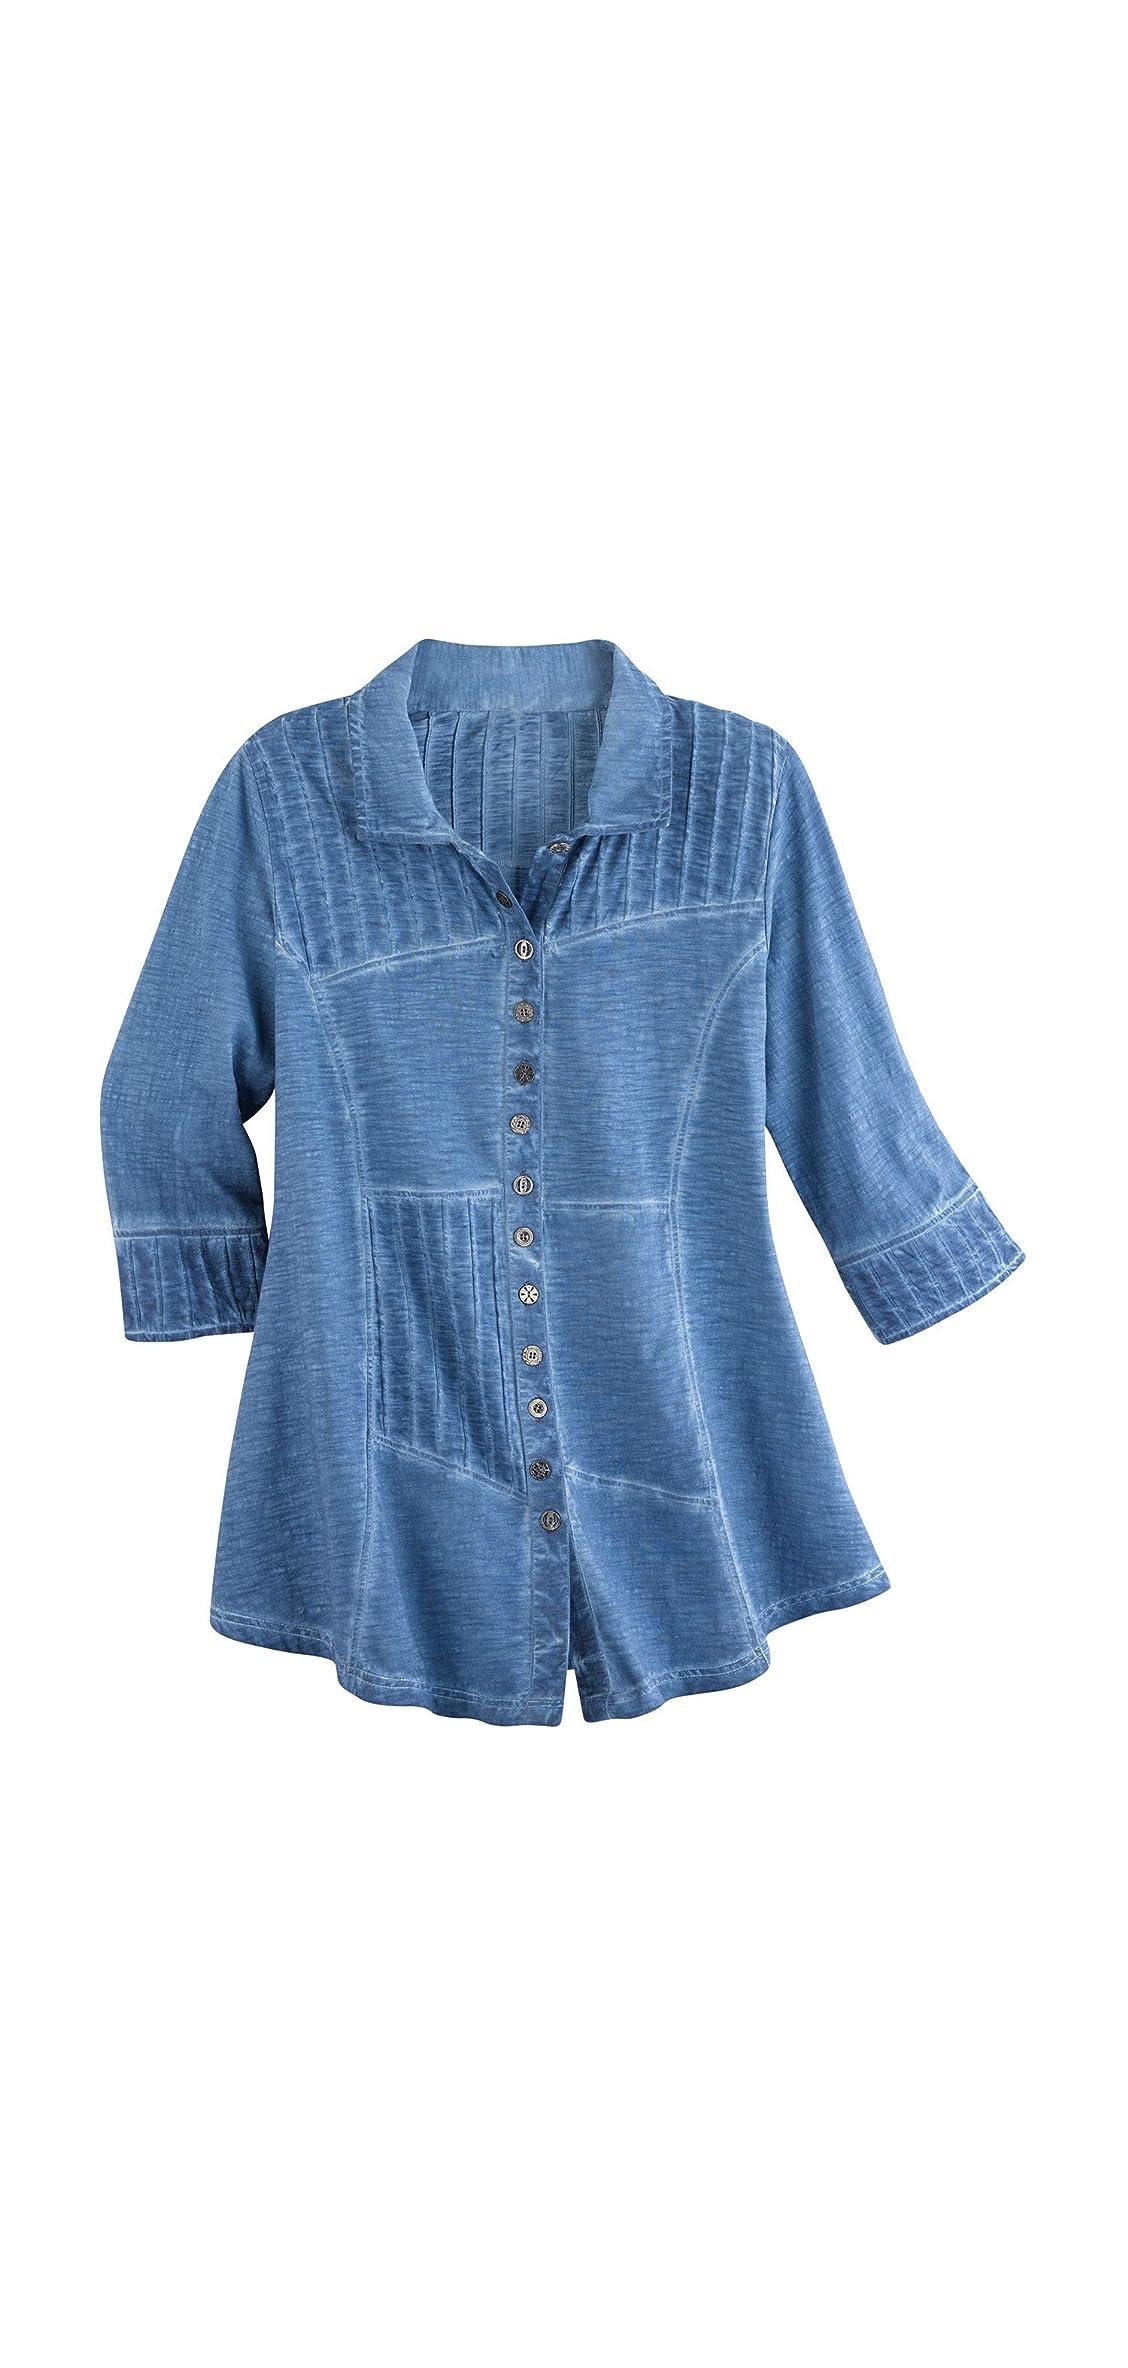 Women's Pin Tuck Tunic Top - Button Front /